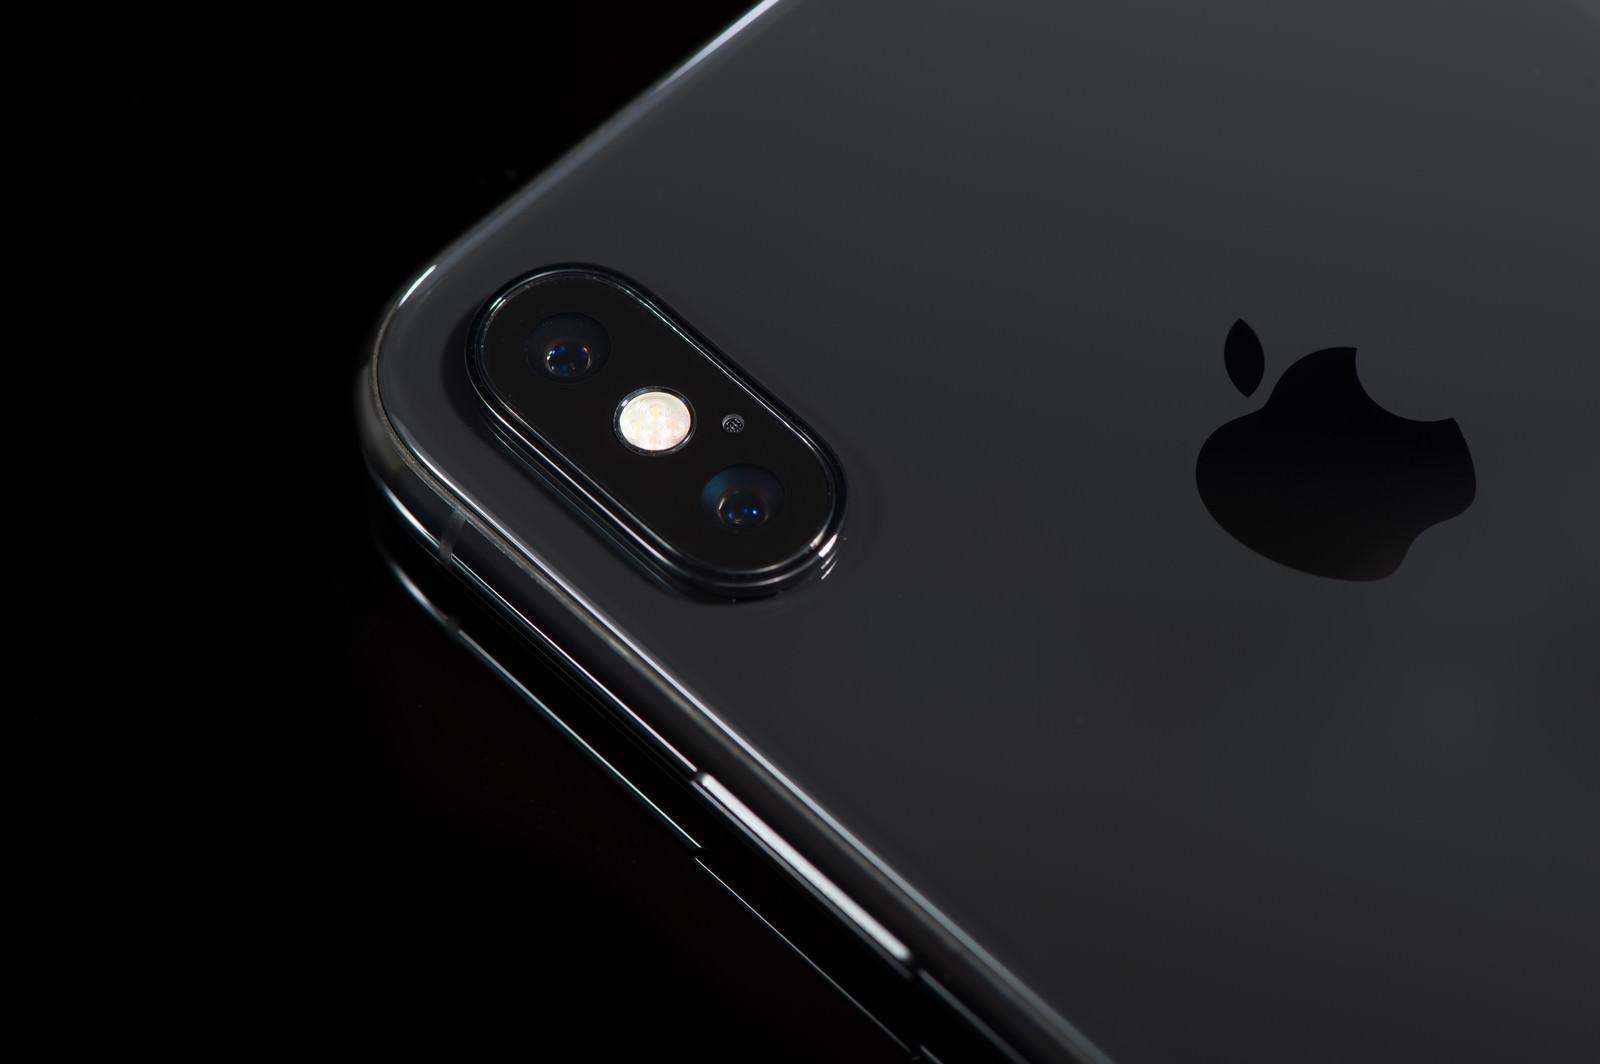 「iPhone X のデュアルレンズカメラiPhone X のデュアルレンズカメラ」のフリー写真素材を拡大